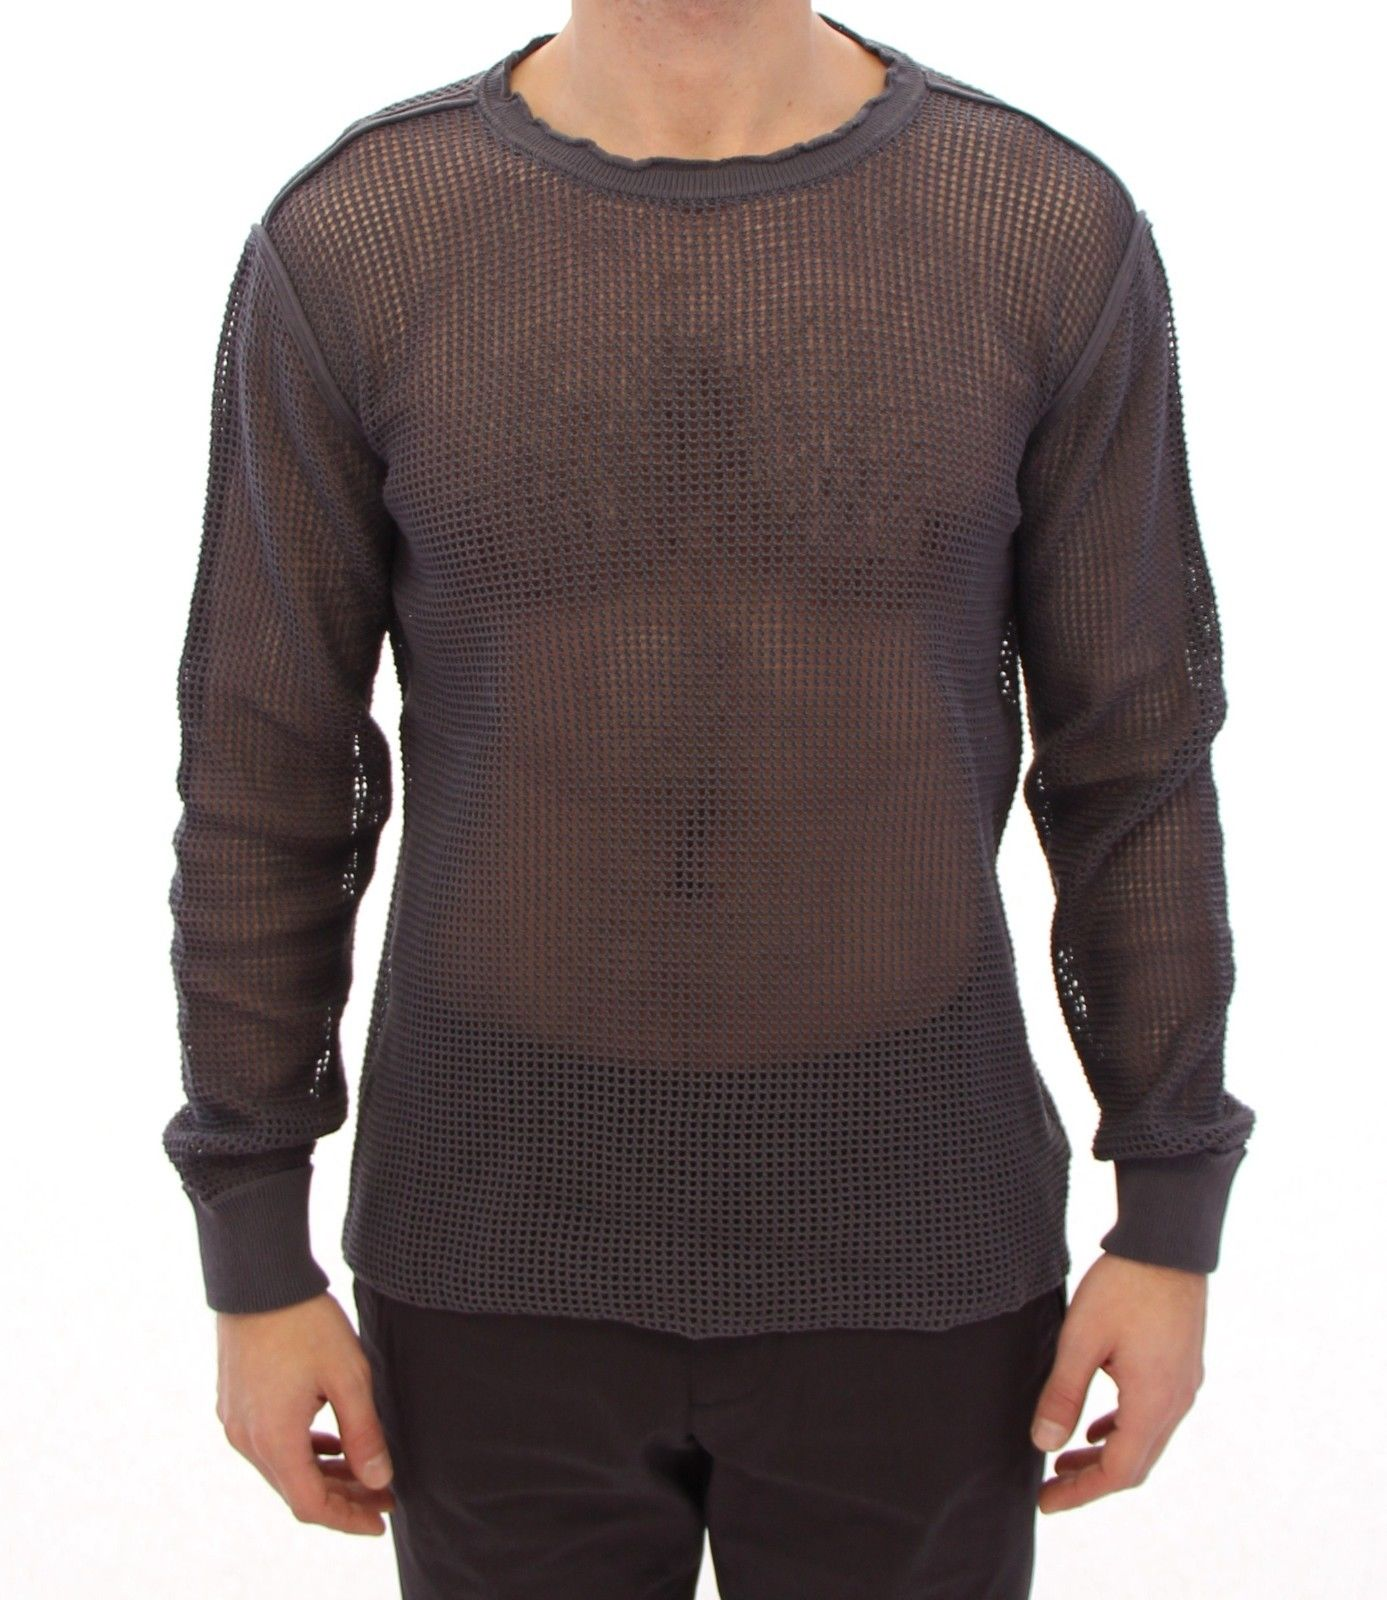 Dolce & Gabbana Men's Runway Netz Pullover Netted Sweater Purple GTH10674 - IT54 | XXL